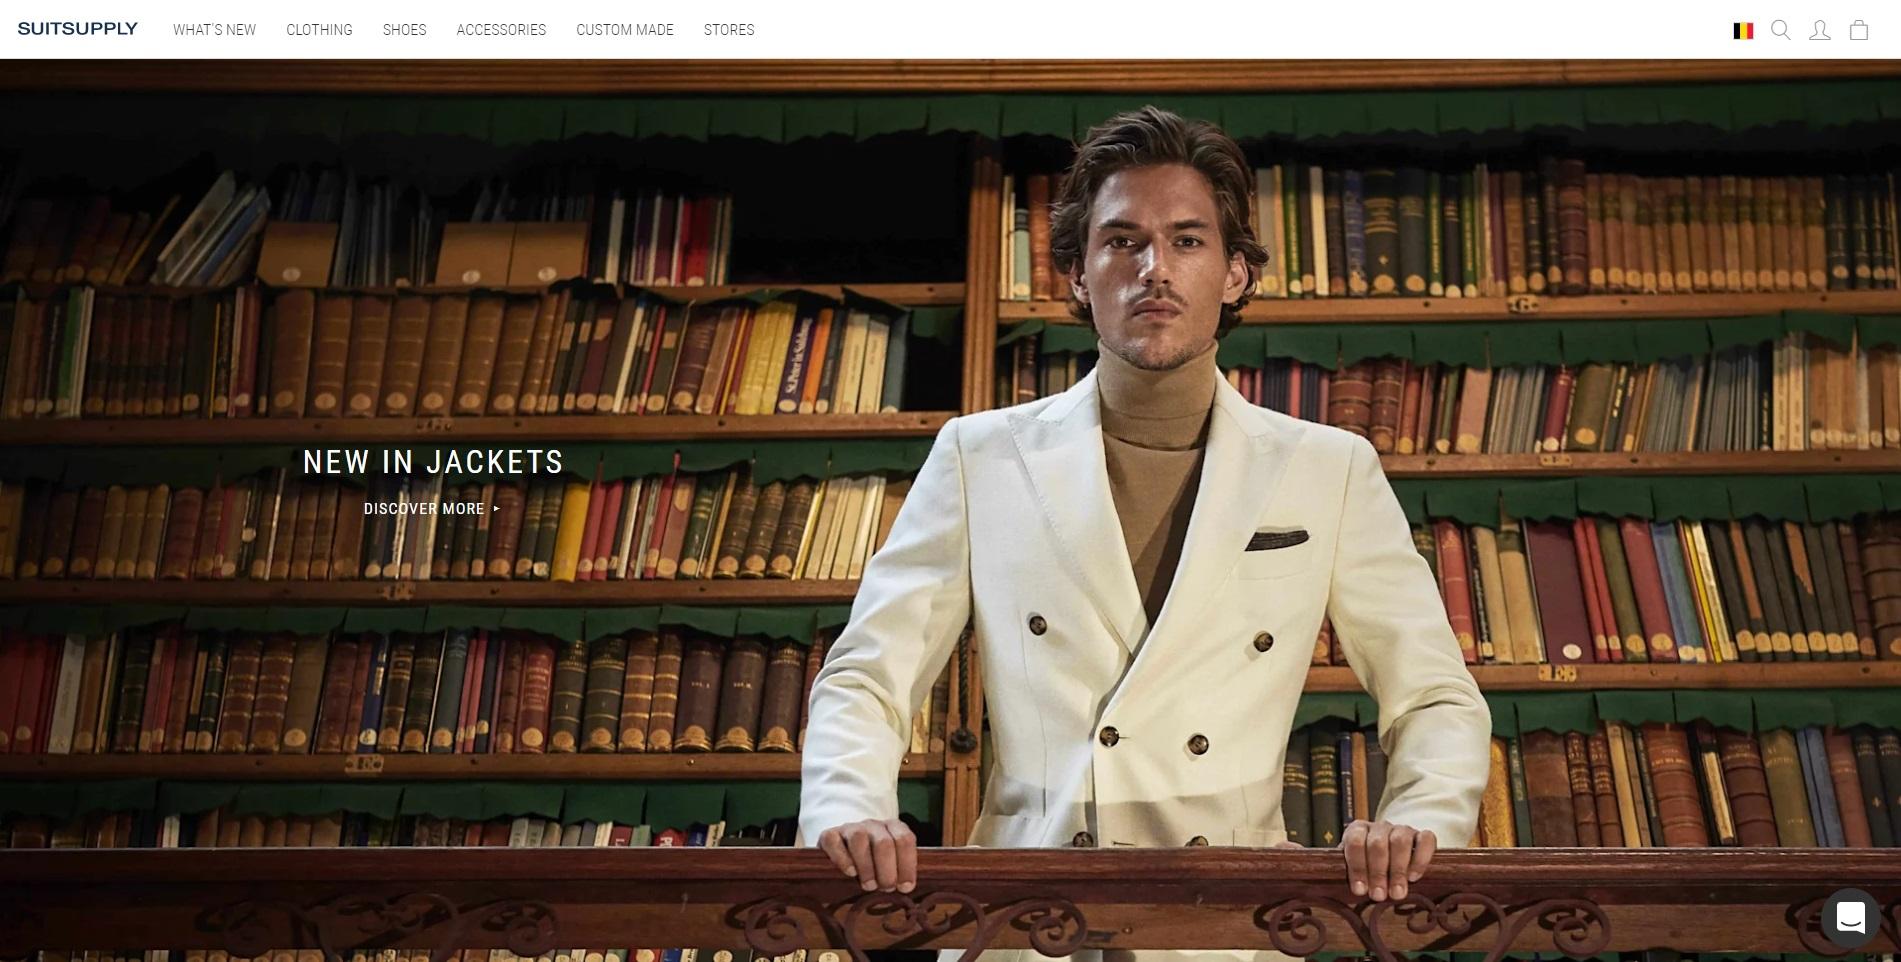 Elegante website van Suitesupply